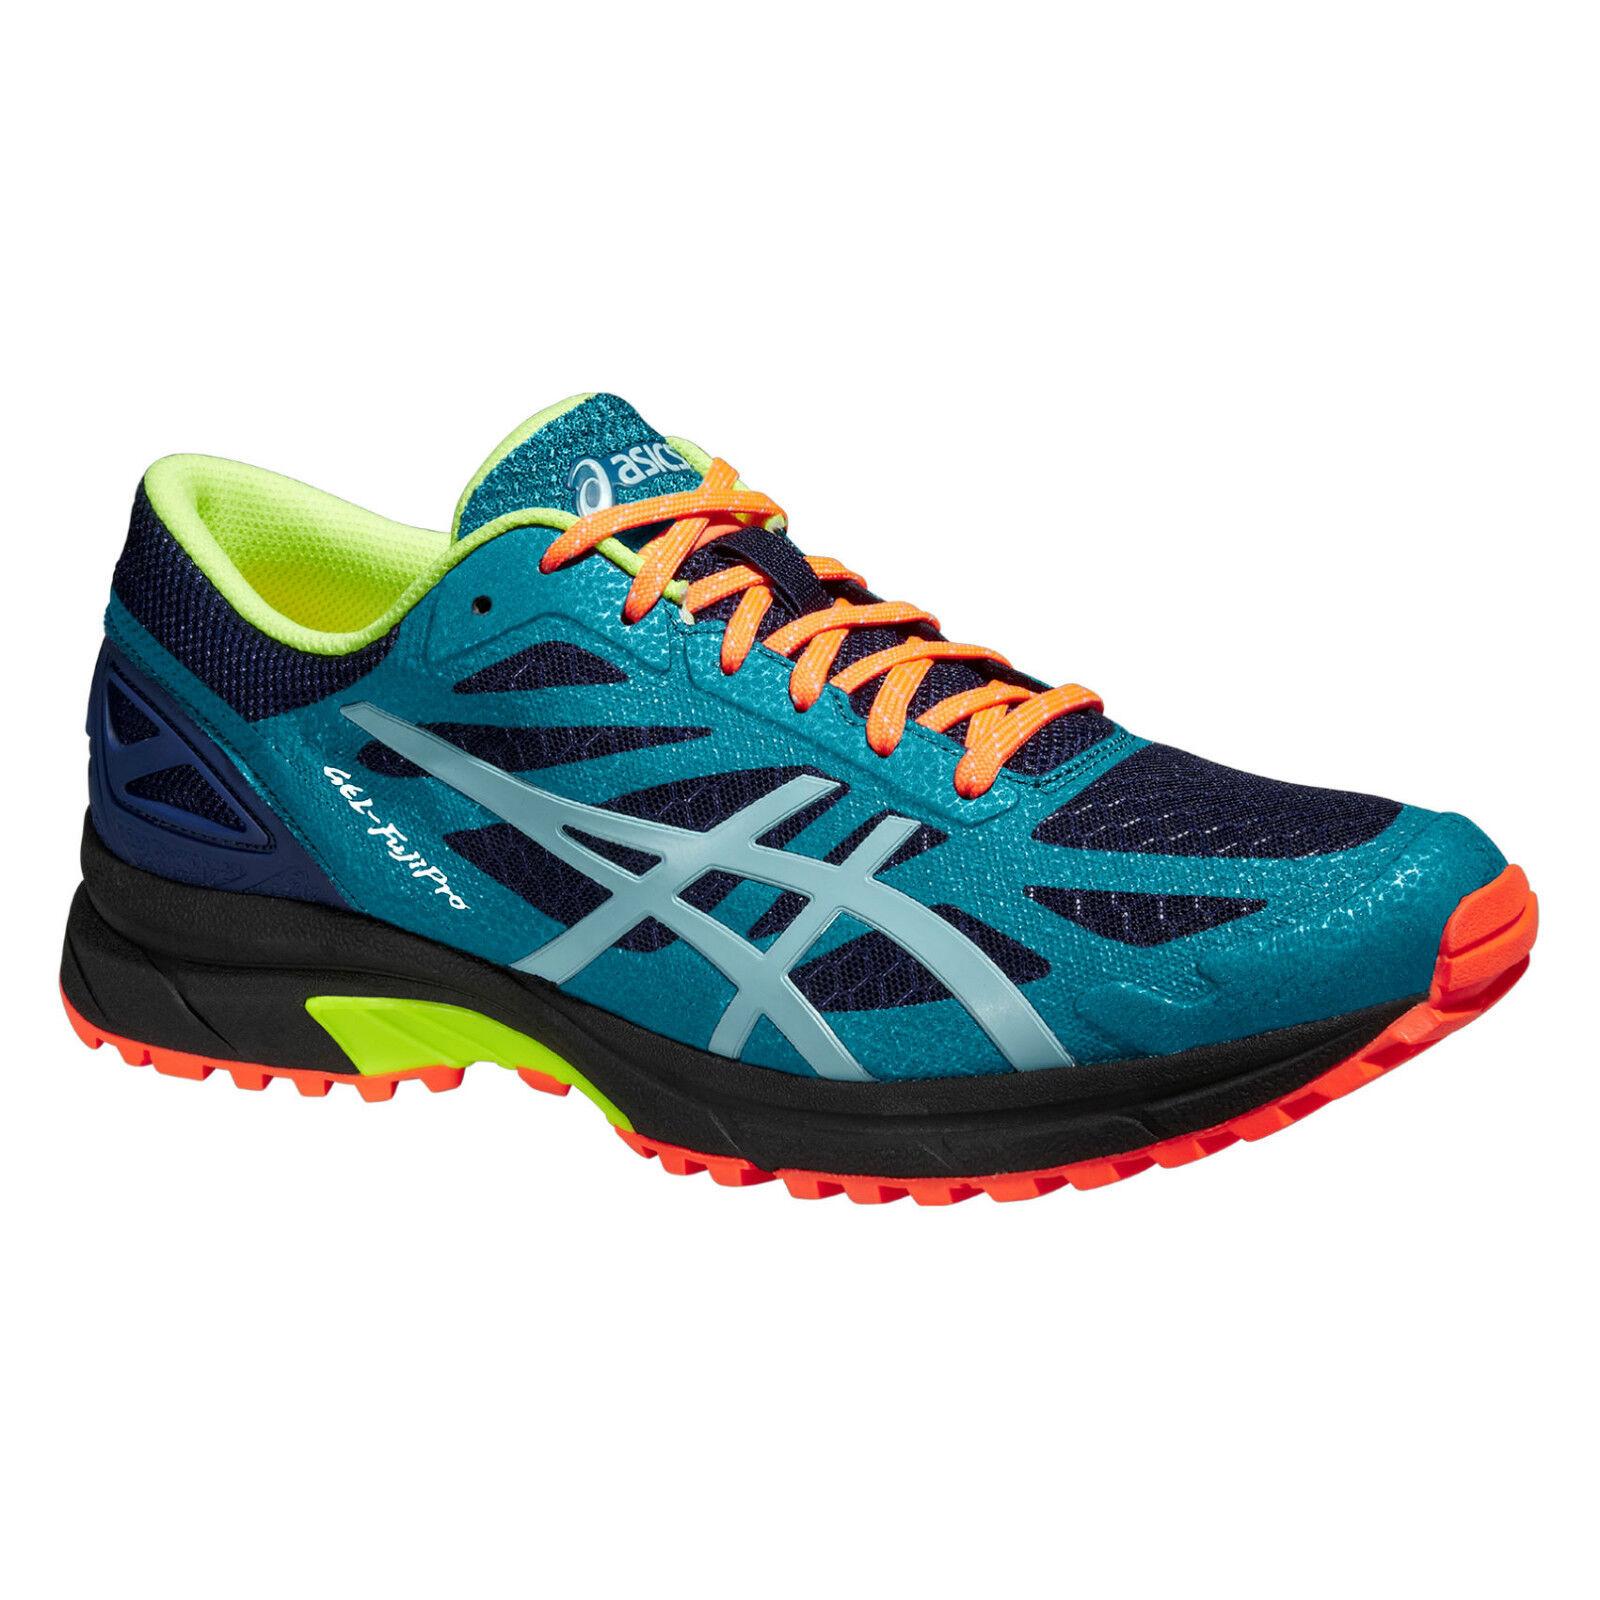 ASICS Gel-Fuji Pro  Herren Cushioned Road Running Sports Trial Schuhes Trainers